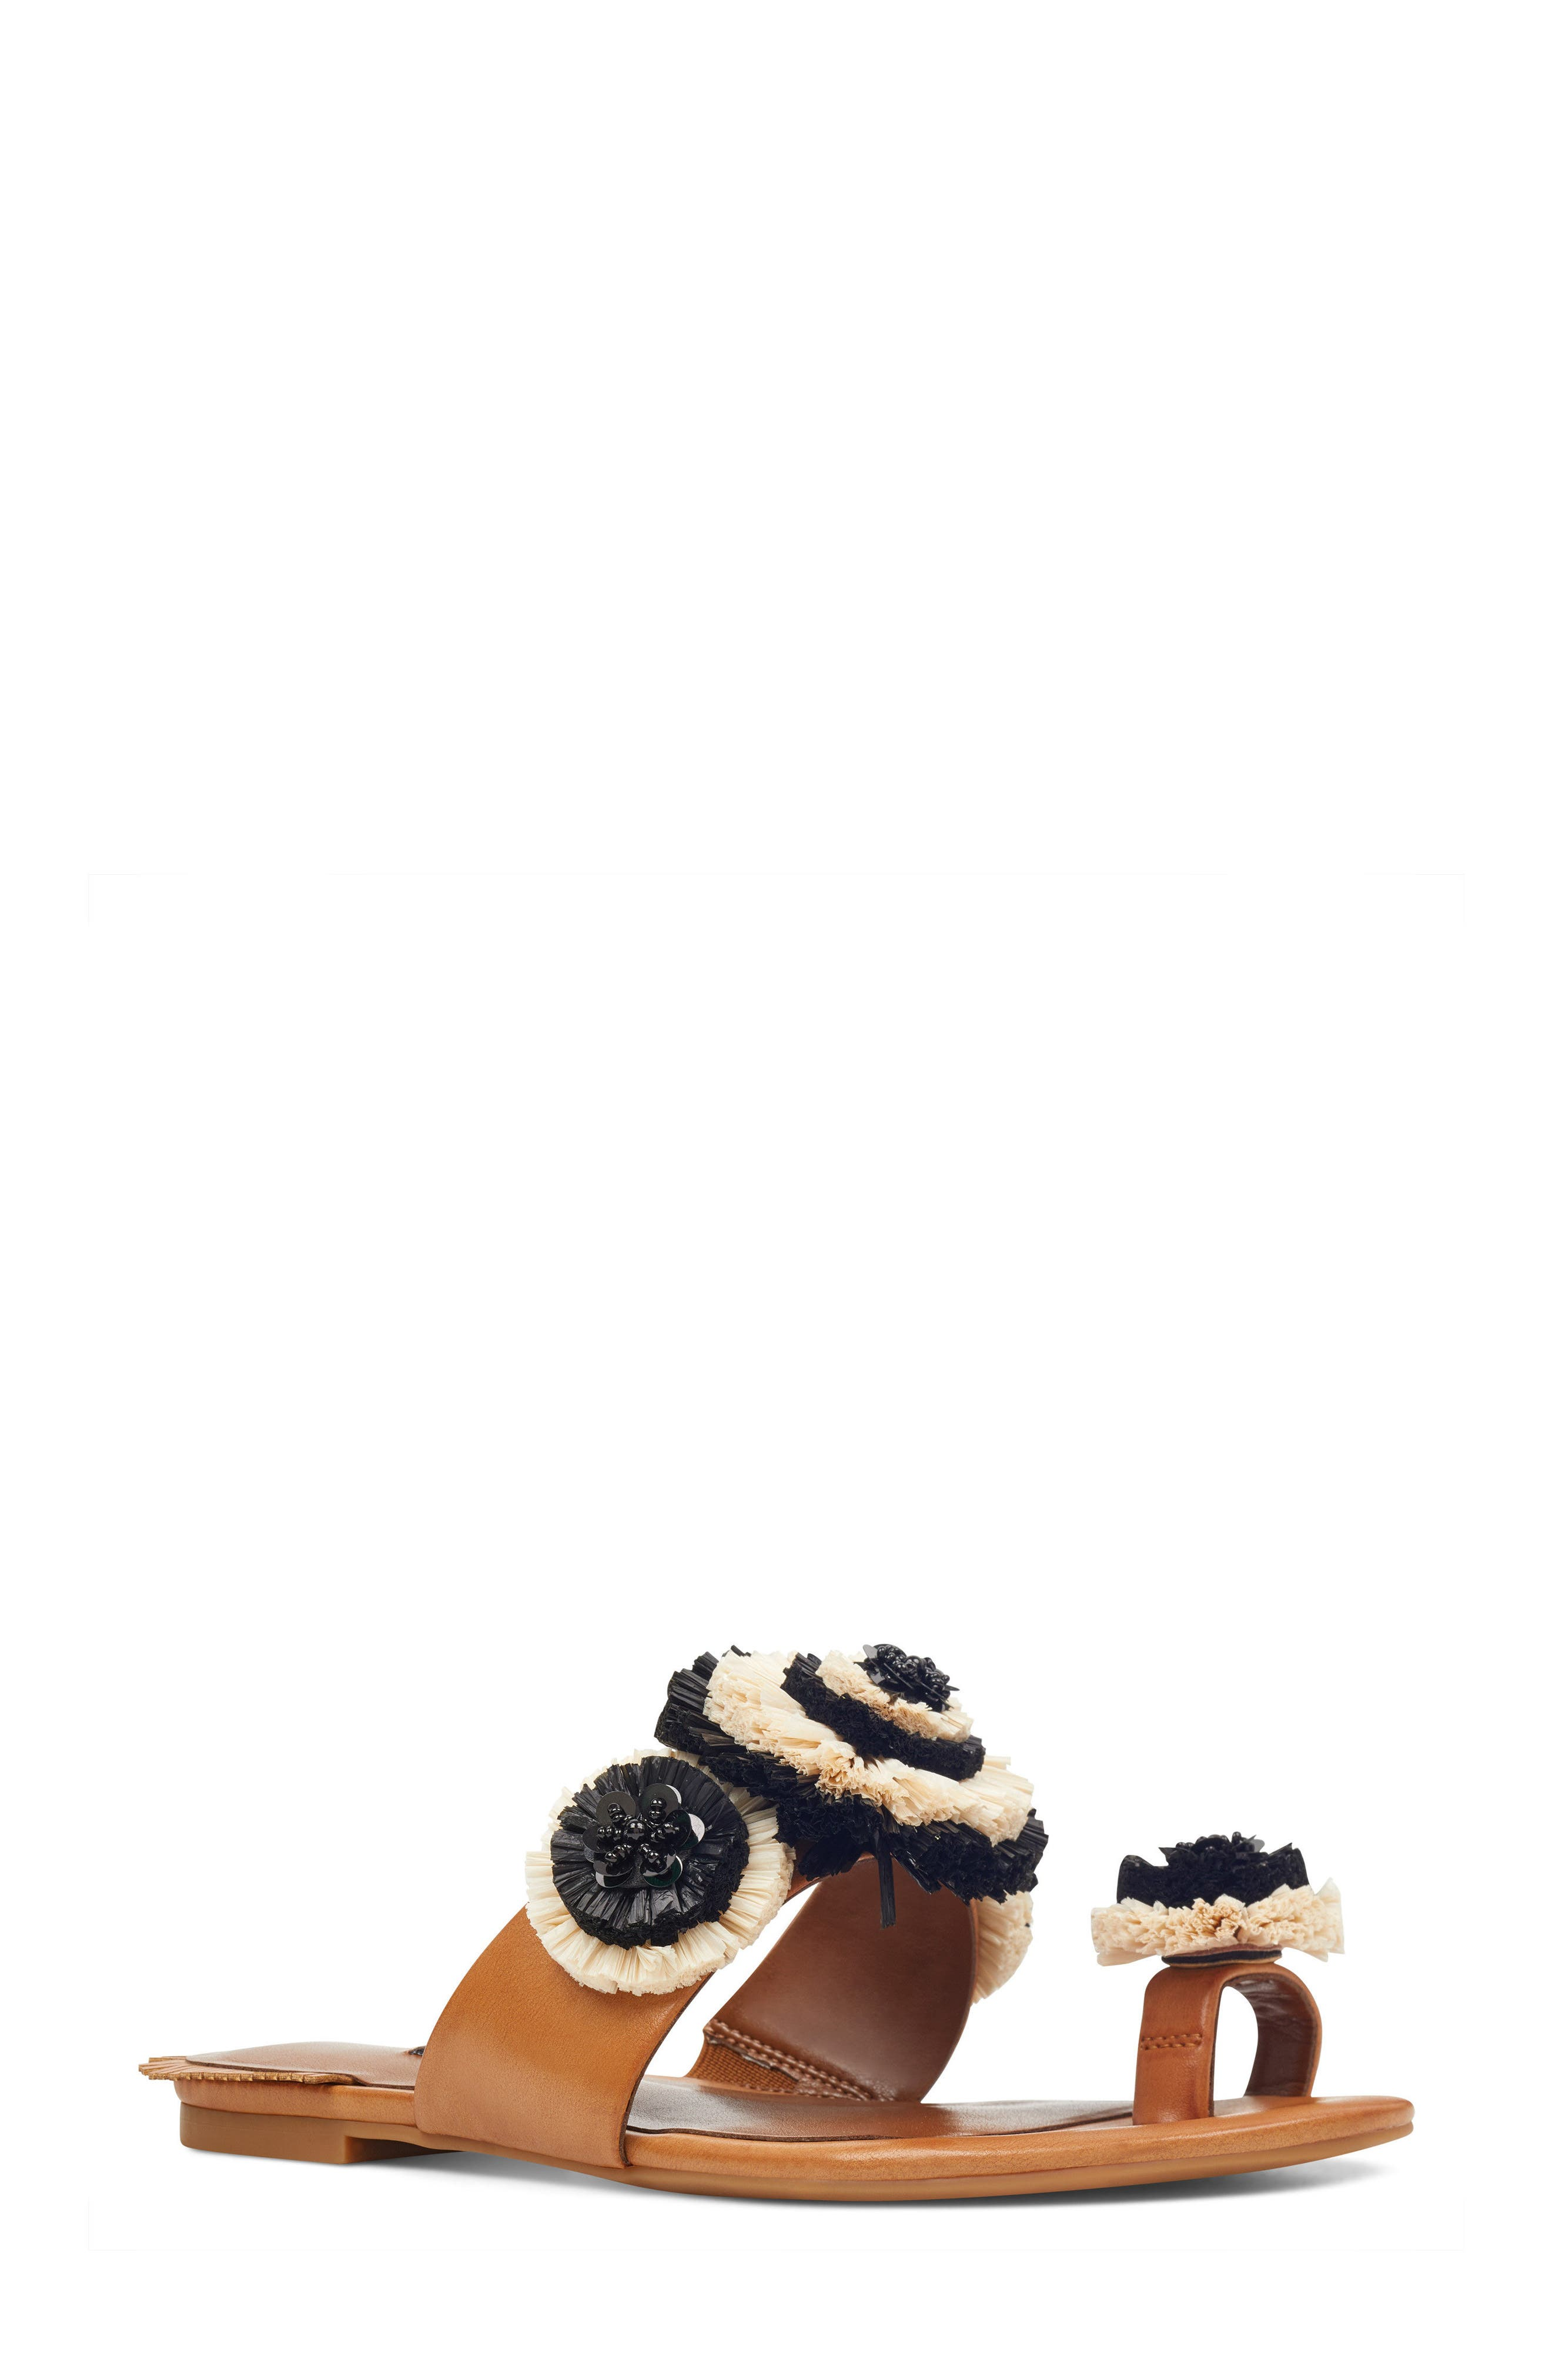 Sendran Raffia Flower Sandal,                             Main thumbnail 1, color,                             Dark Natural Faux Leather